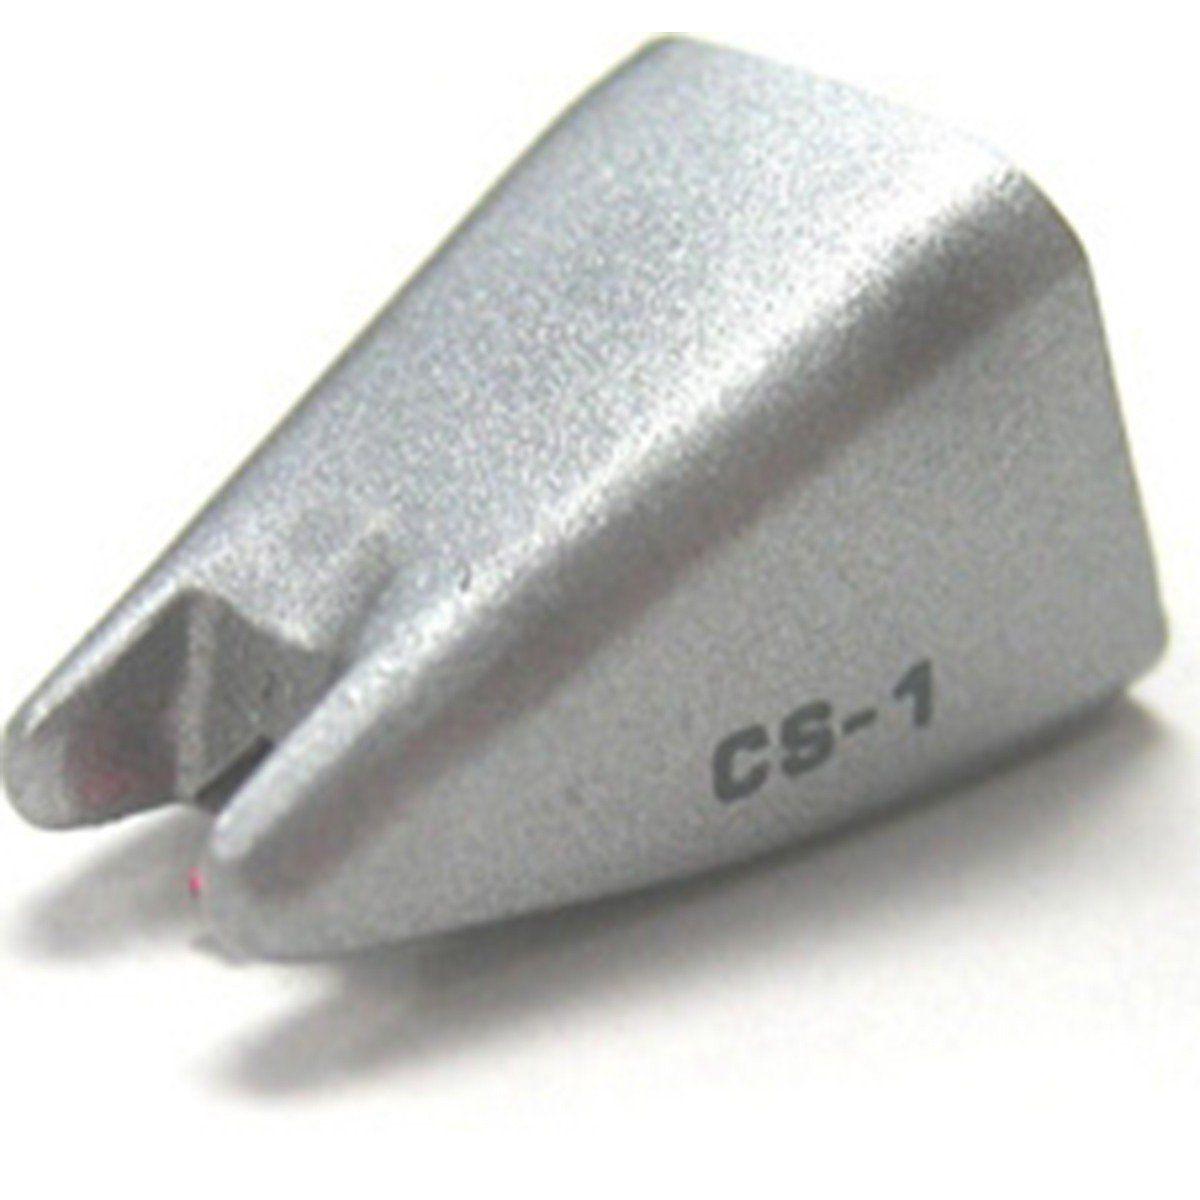 Numark CS 1RS Agulha para toca discos CS-1RS Diamante circular fino